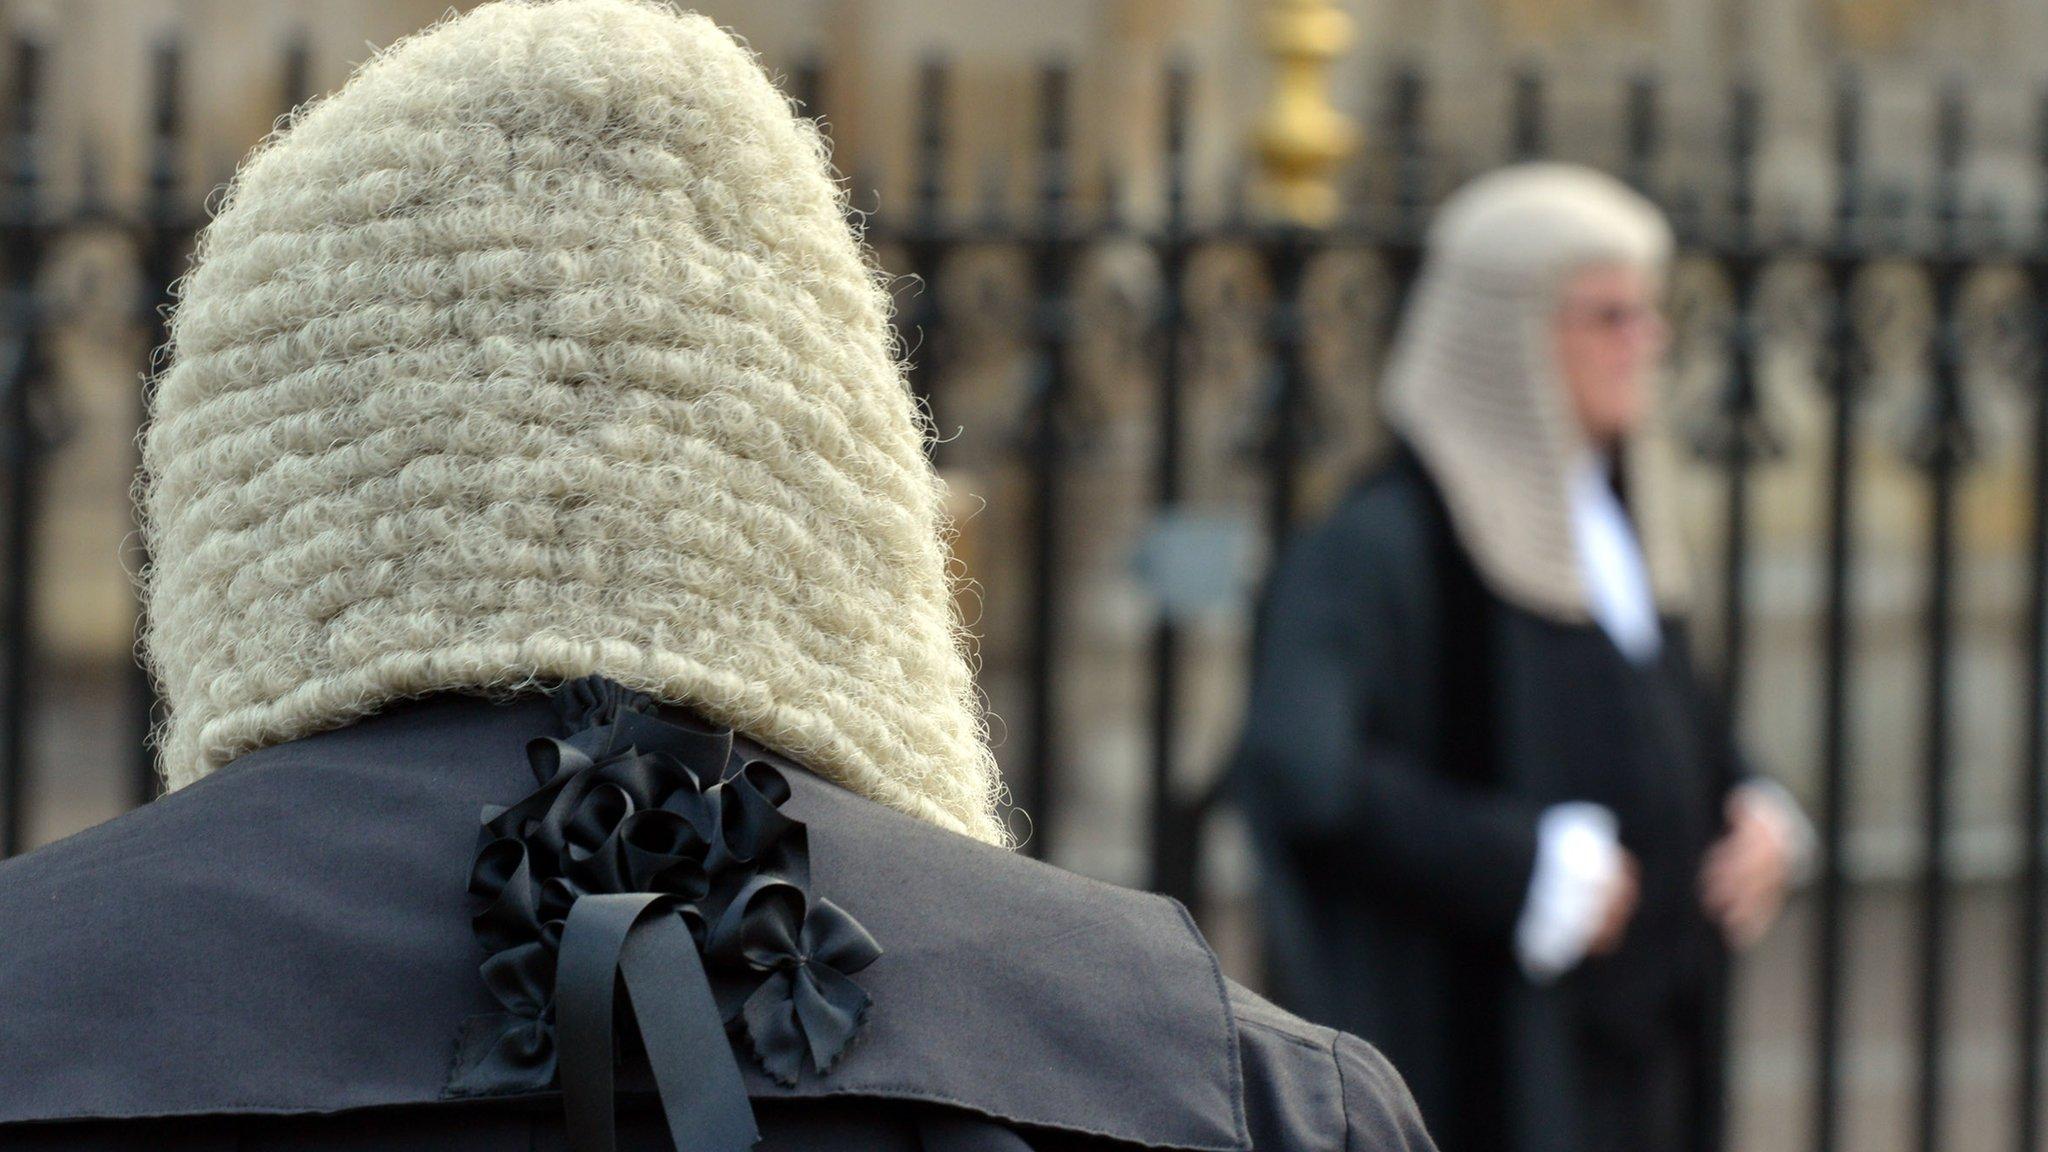 Should judge have sworn at defendant?